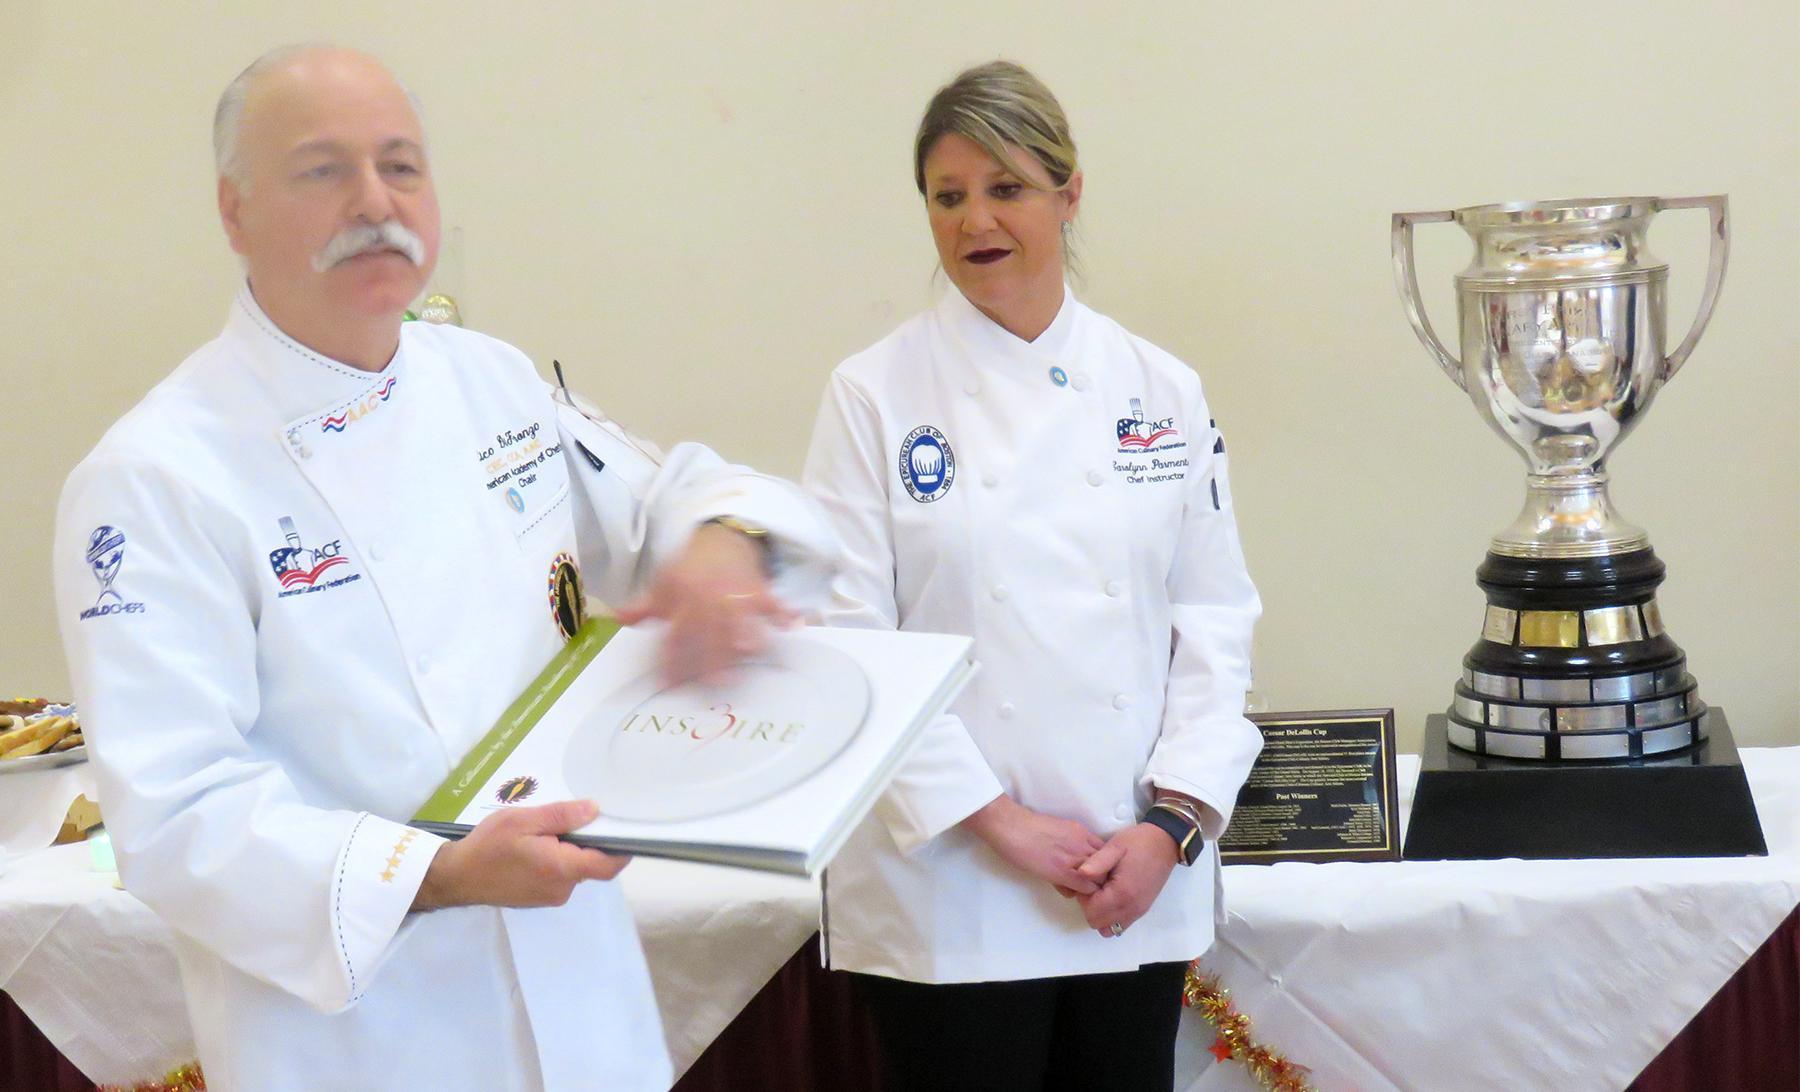 Epicurean Club of Boston Financial Secretary Americo S. DiFronzo presents a book to EHS Culinary Arts Director Carolynn Parmenter